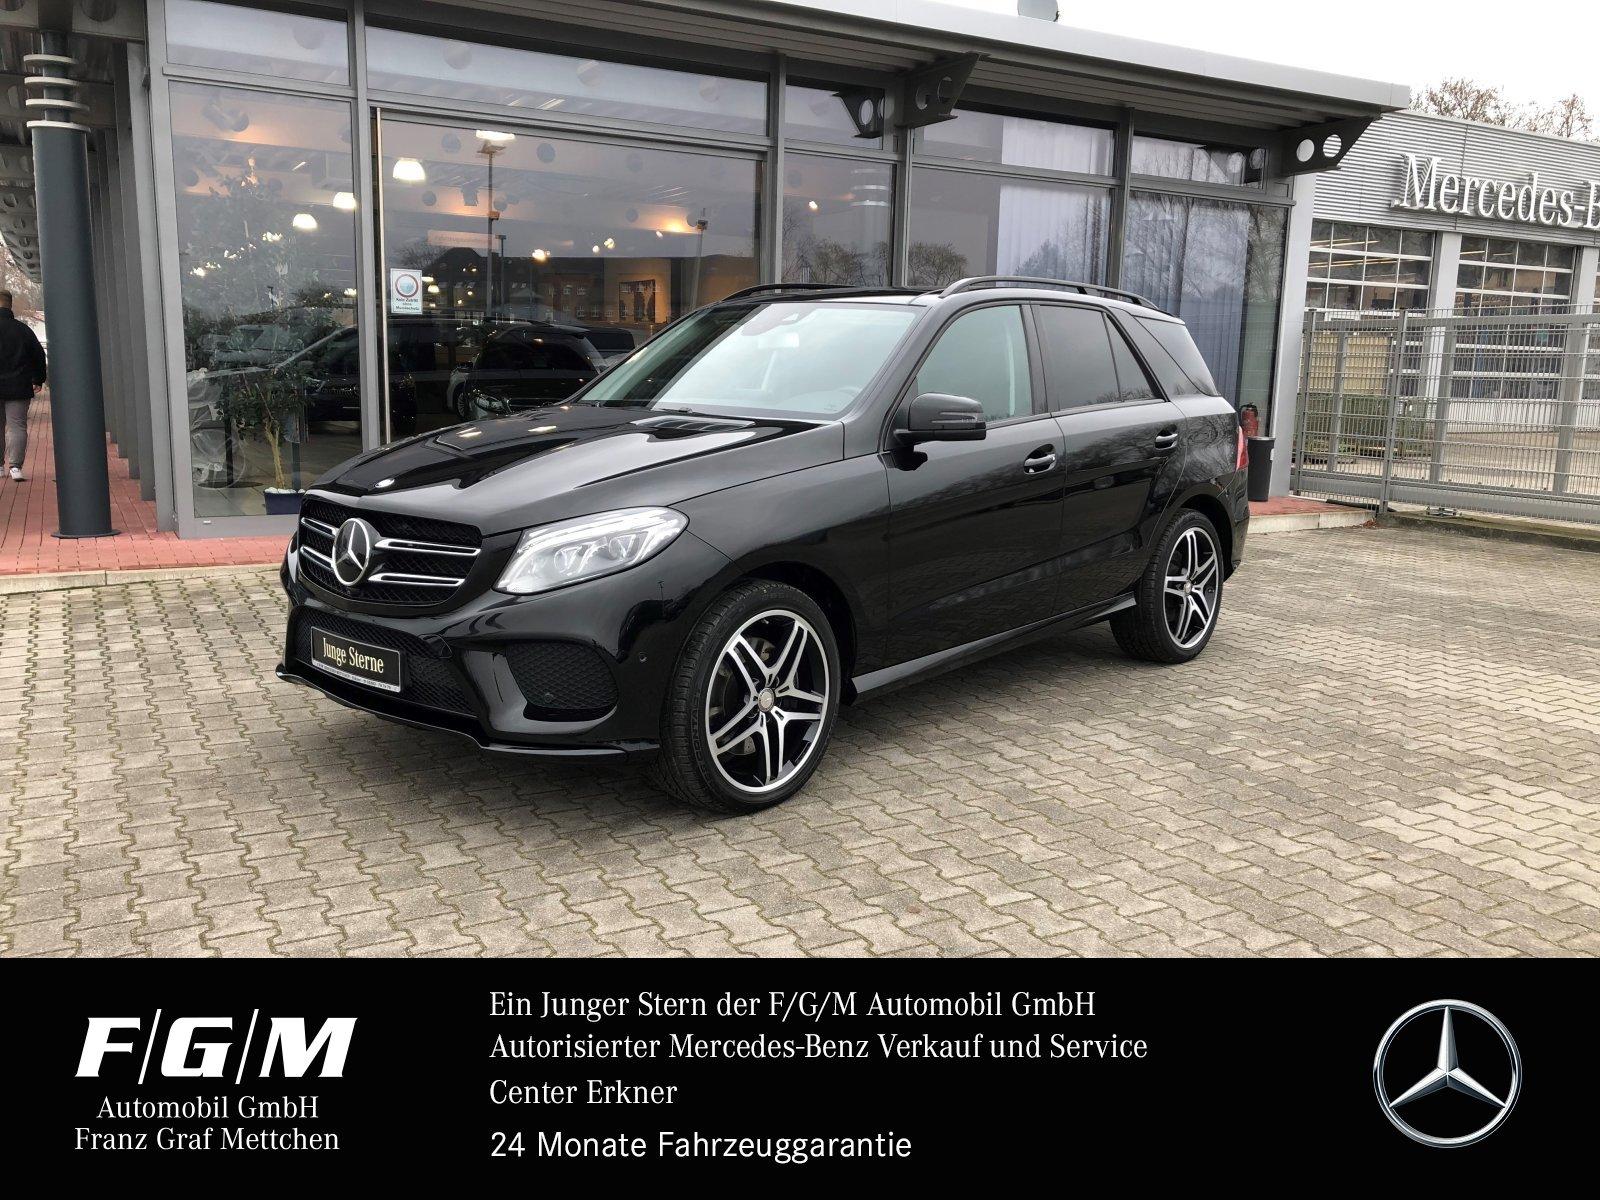 Mercedes-Benz GLE 450 AMG COM/ILS/Night/Airmatic/Distr/PanoDac, Jahr 2016, Benzin